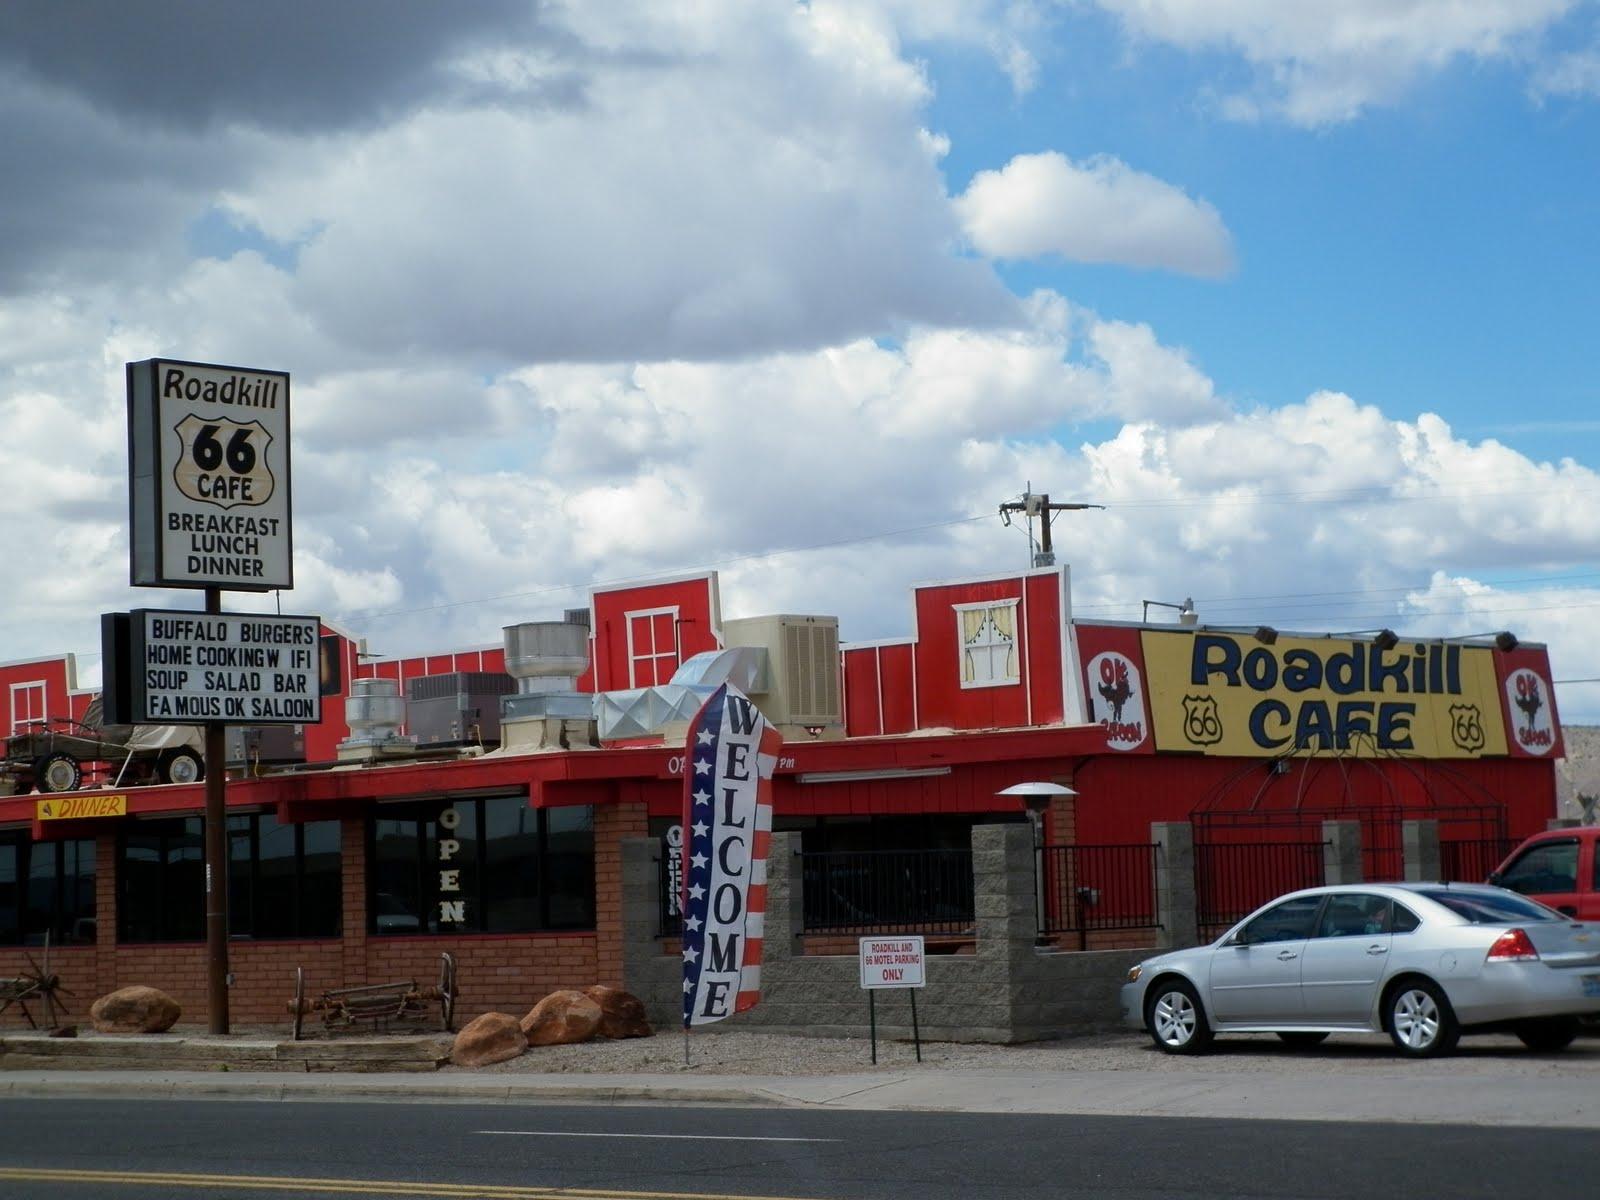 Cafés and the City: USA - miltä kahvi siellä maistuu